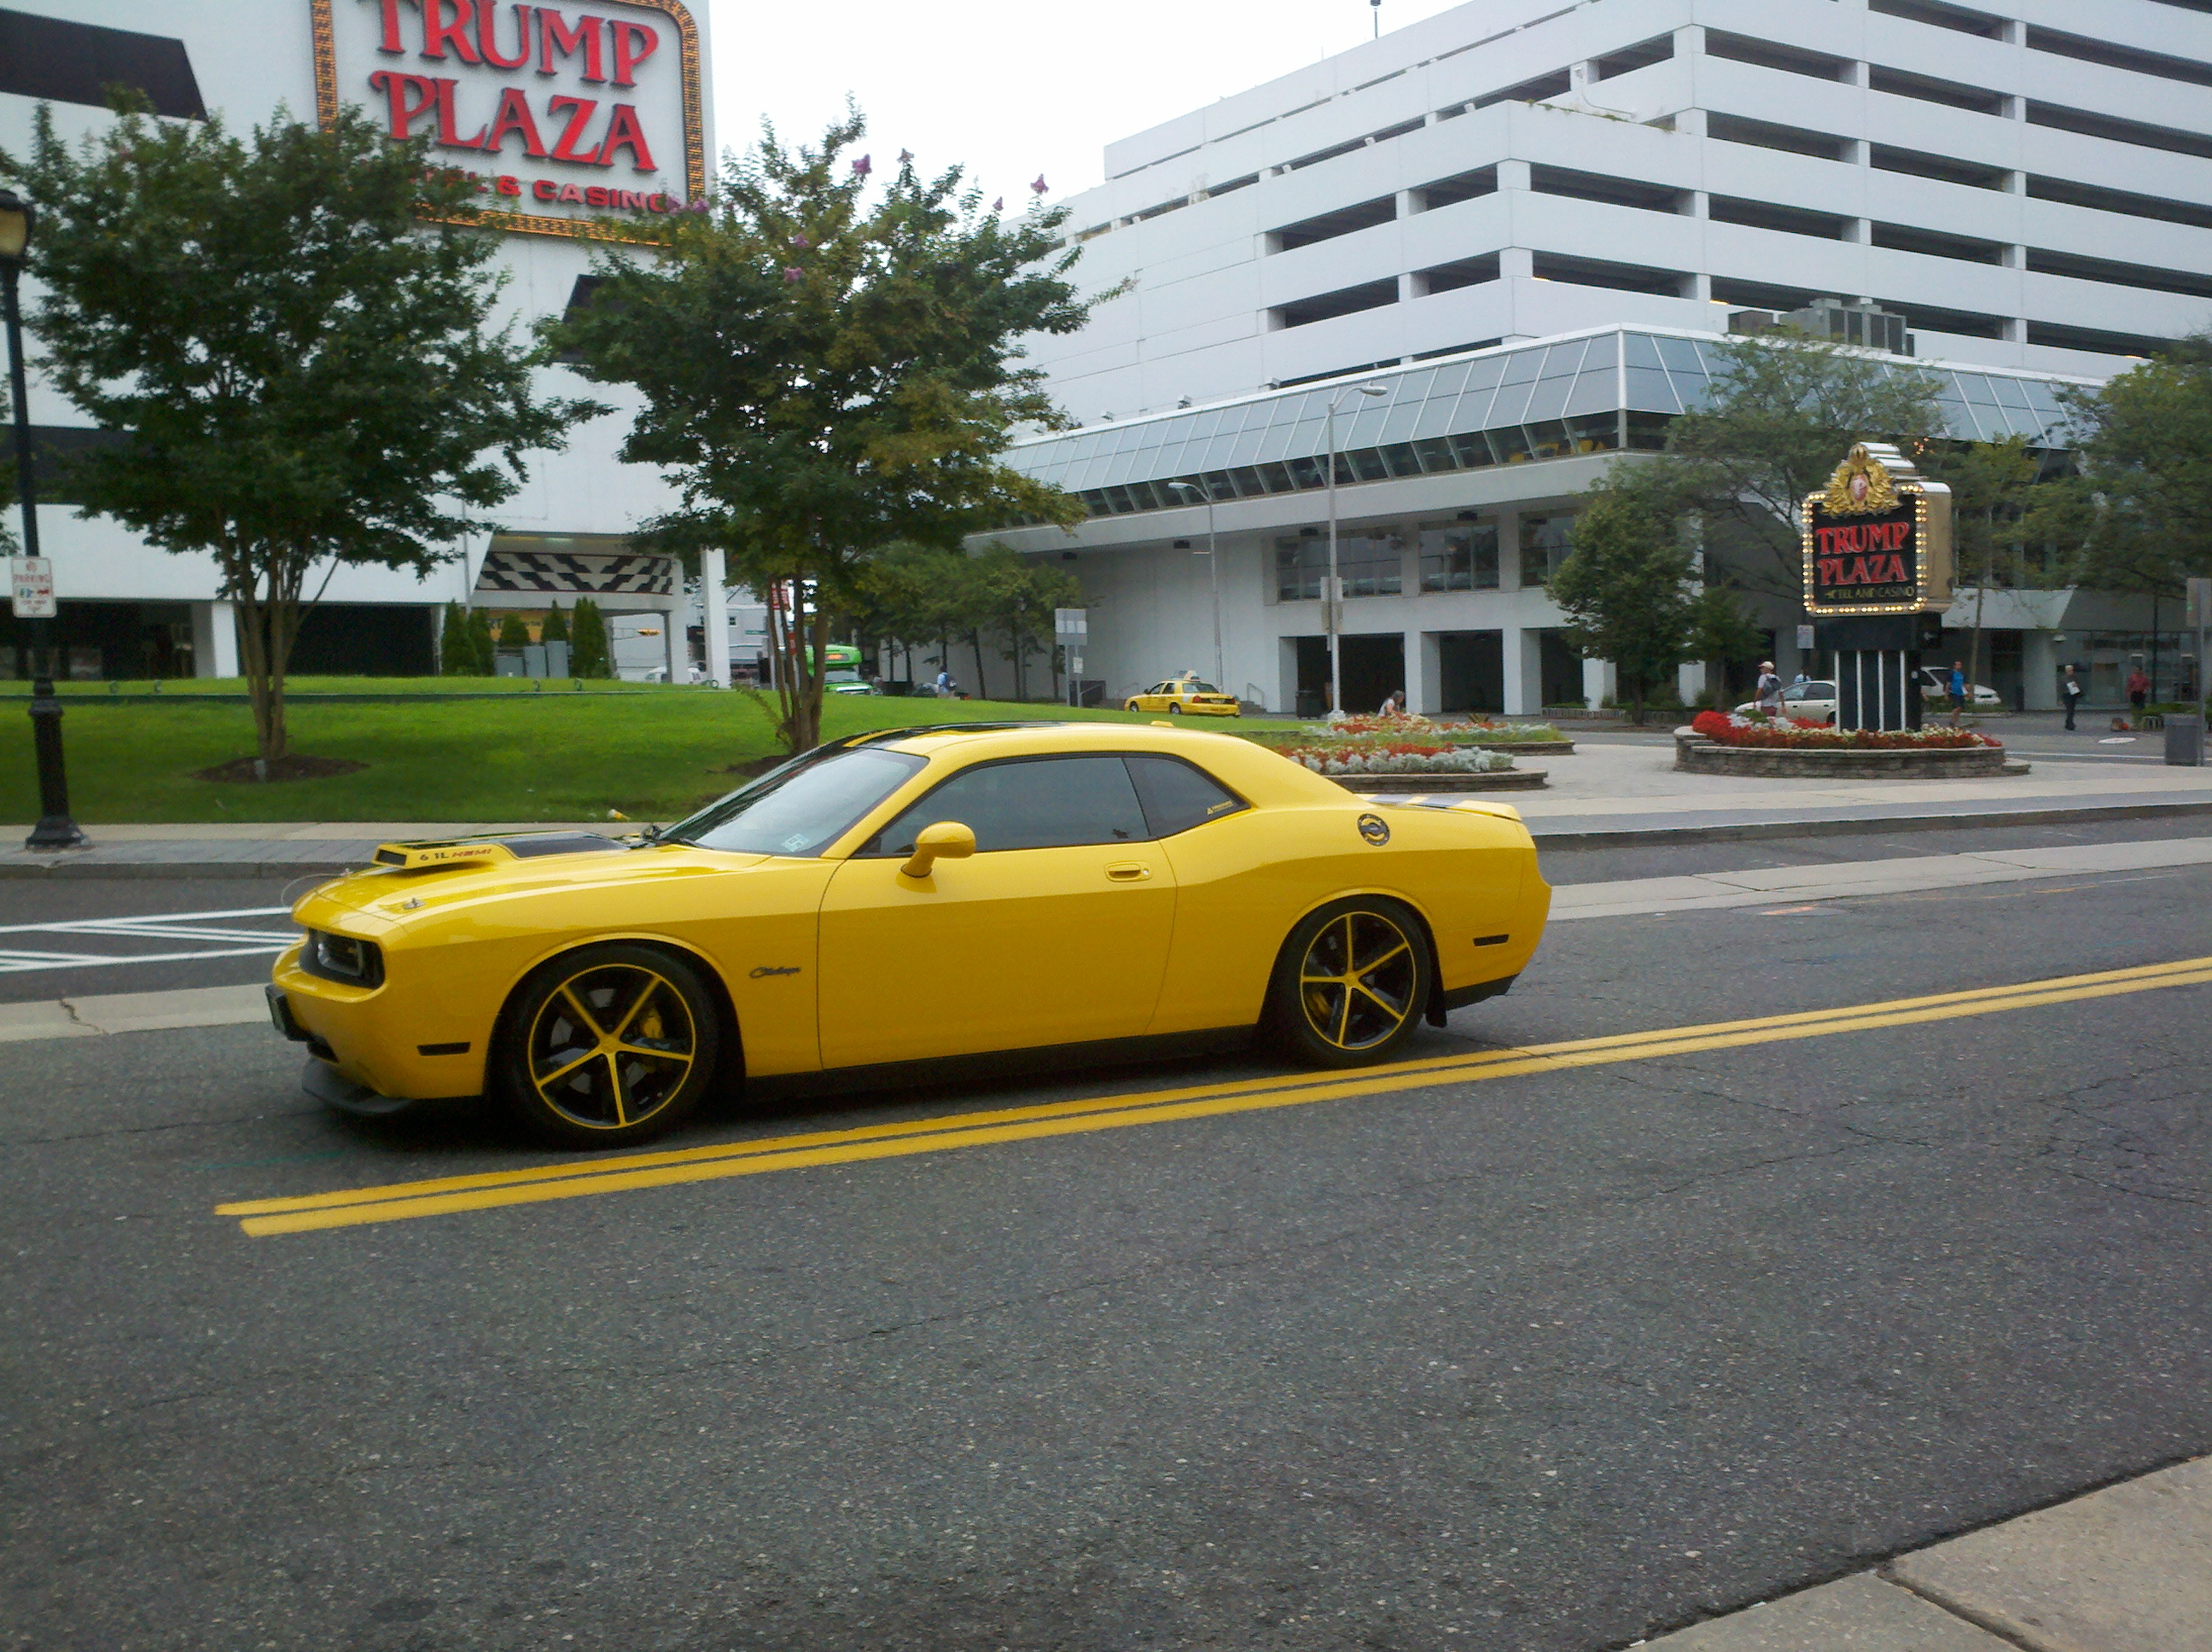 Hamilton Towship Nj Car Dealerships